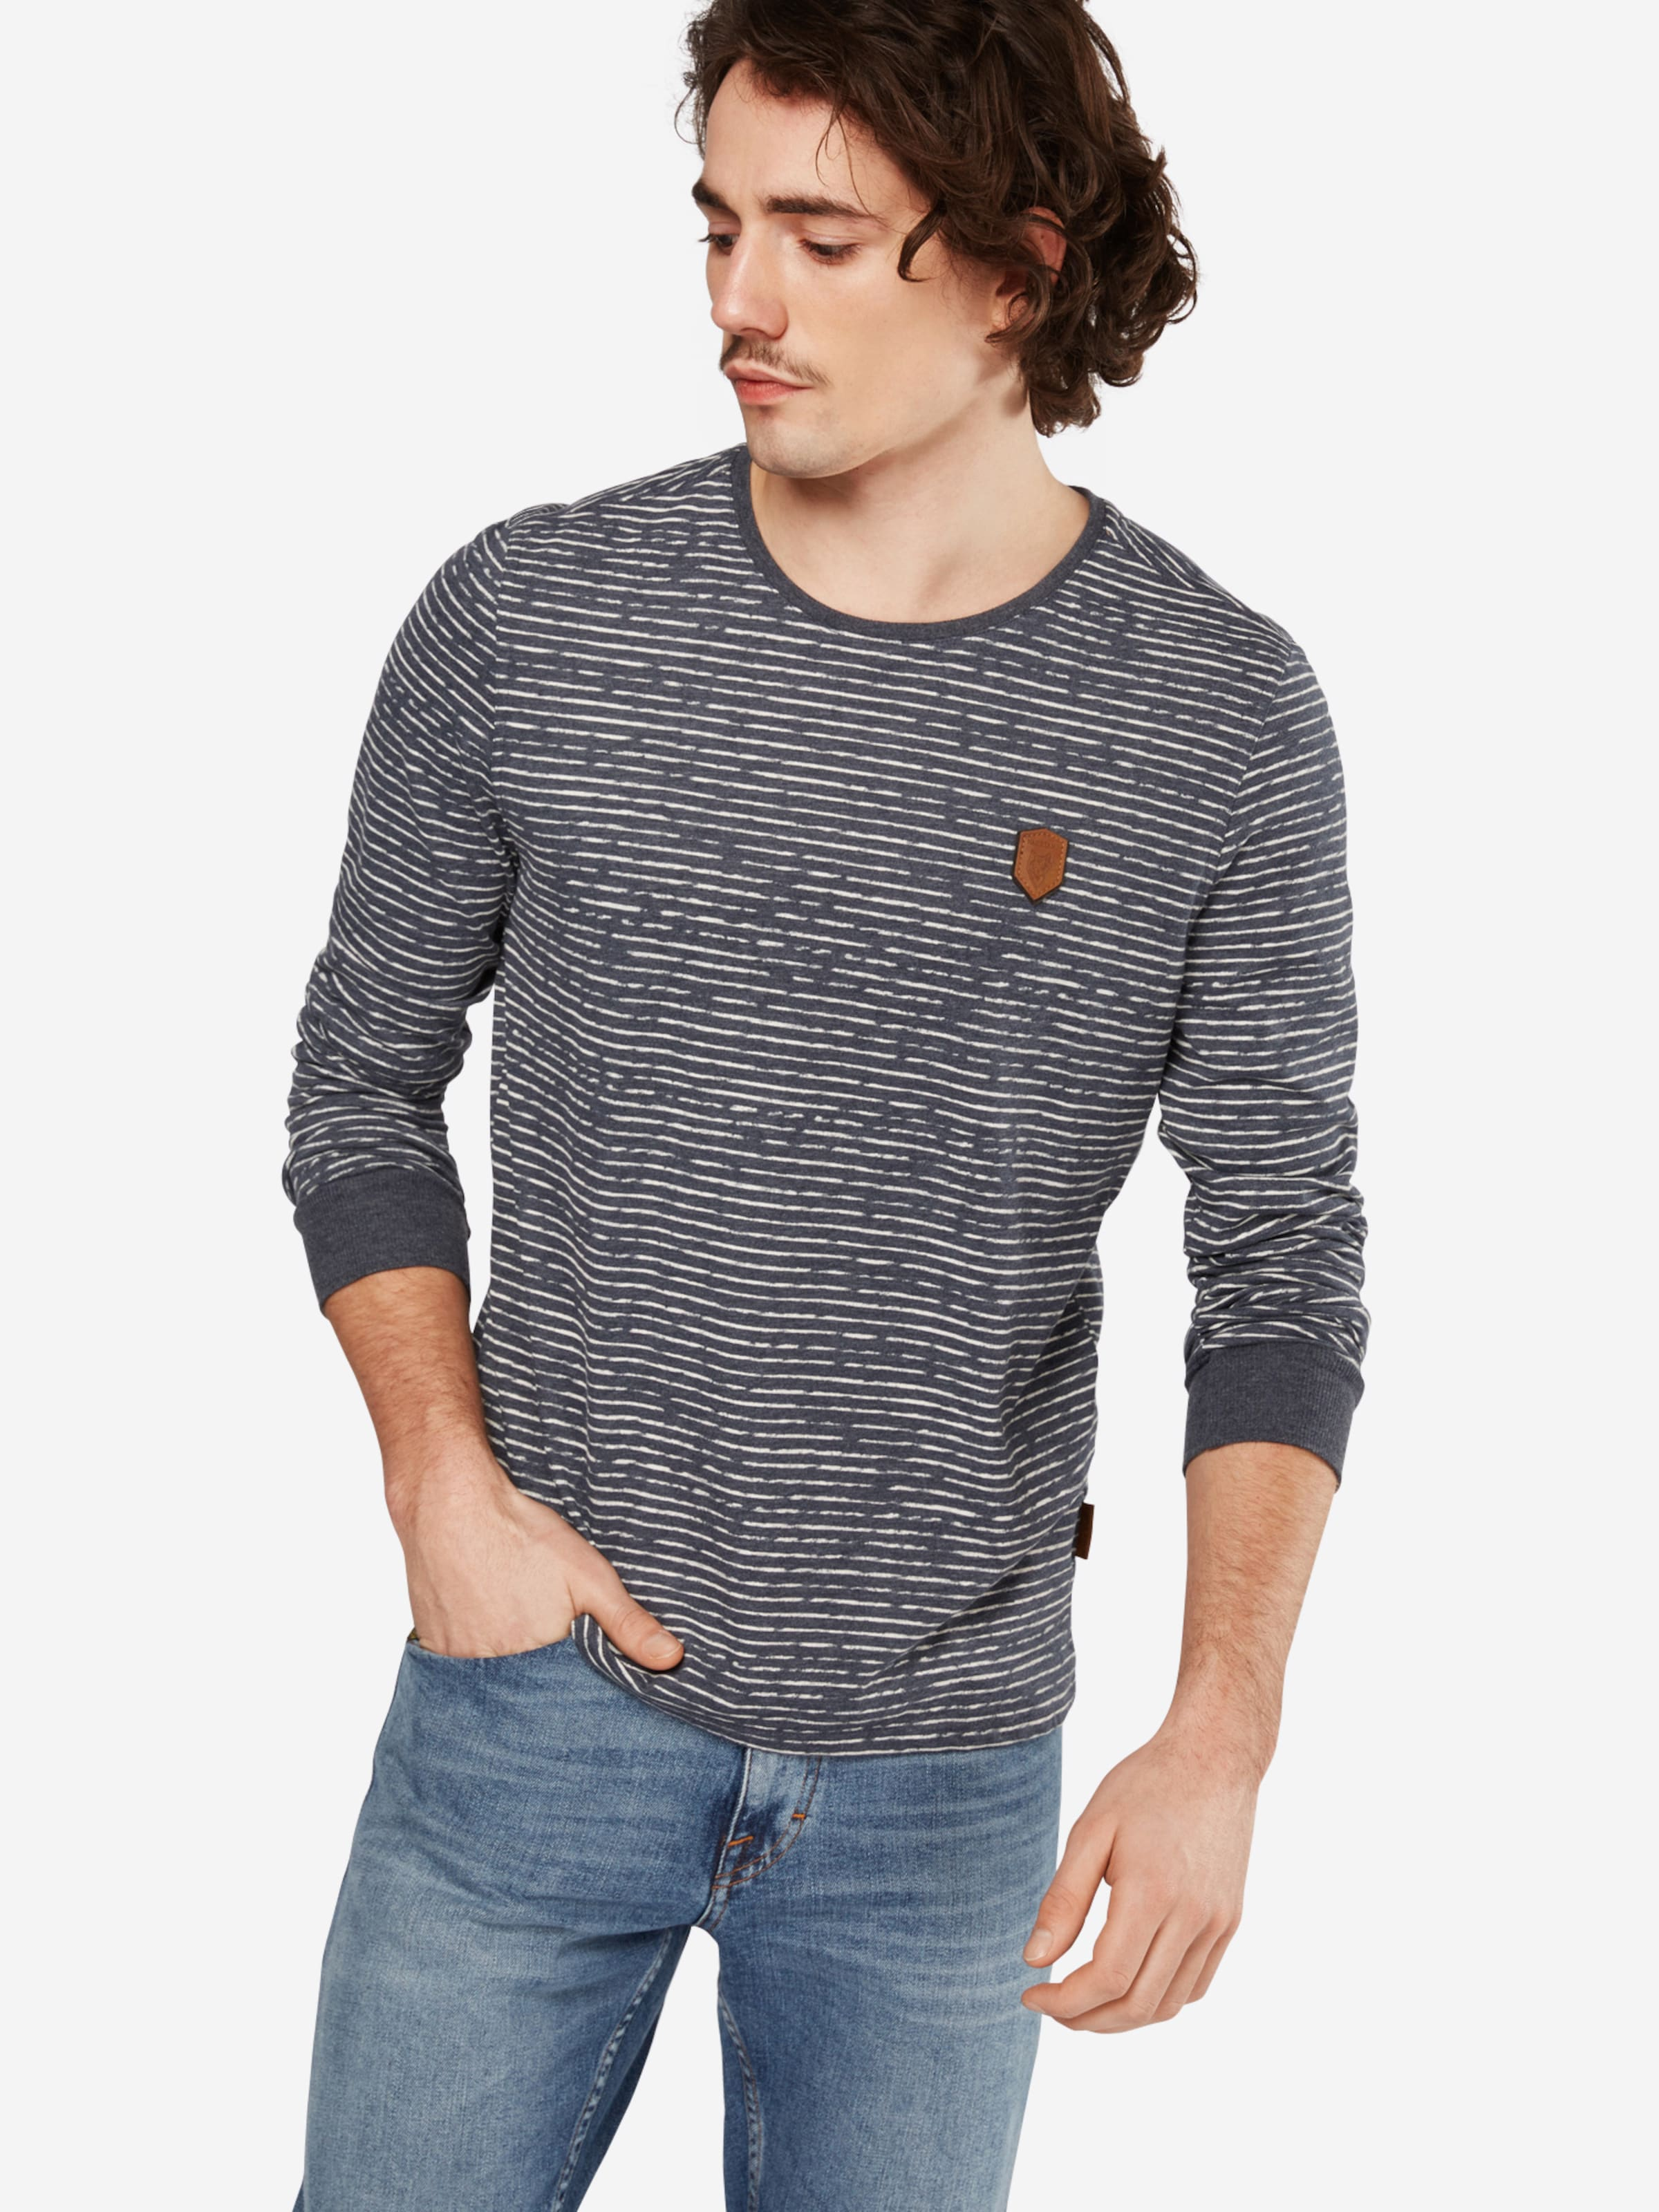 shirt T Indigo En Langen' Naketano 'hosenpuper yvOm80wNn